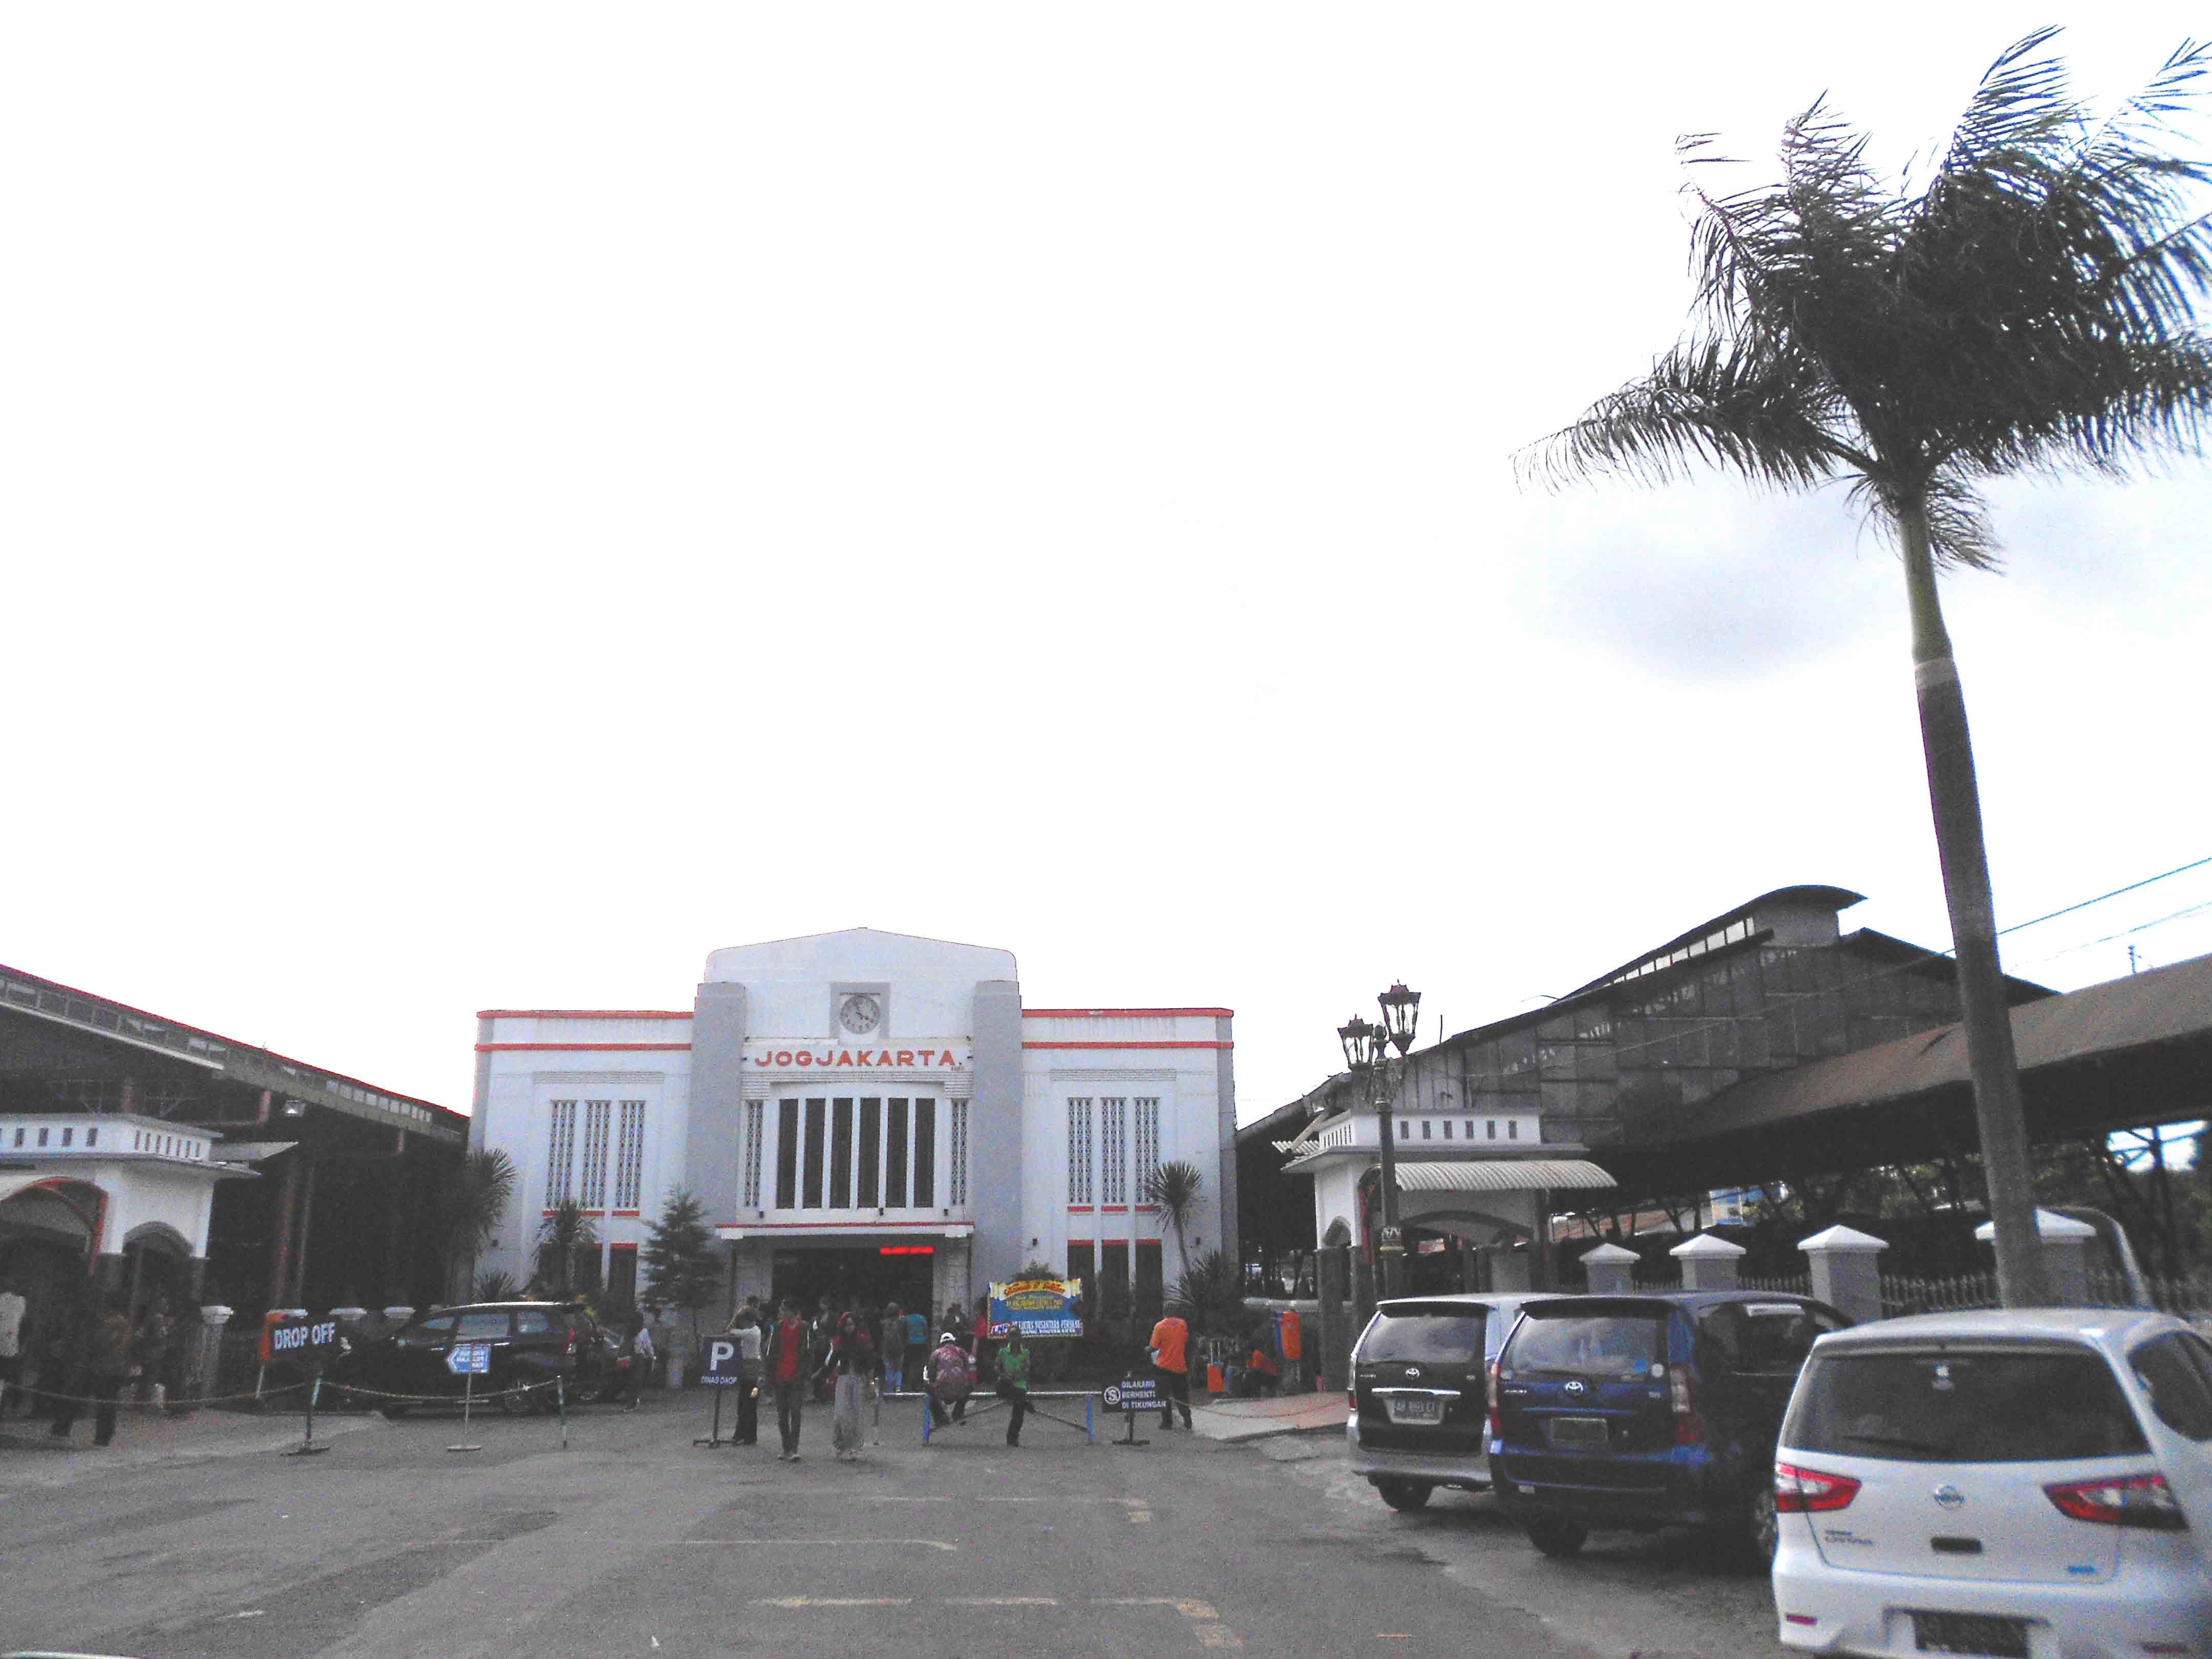 Stasiun Tugu Yogyakarta Balai Pelestarian Cagar Budaya Jawa Tengah Pemerintah